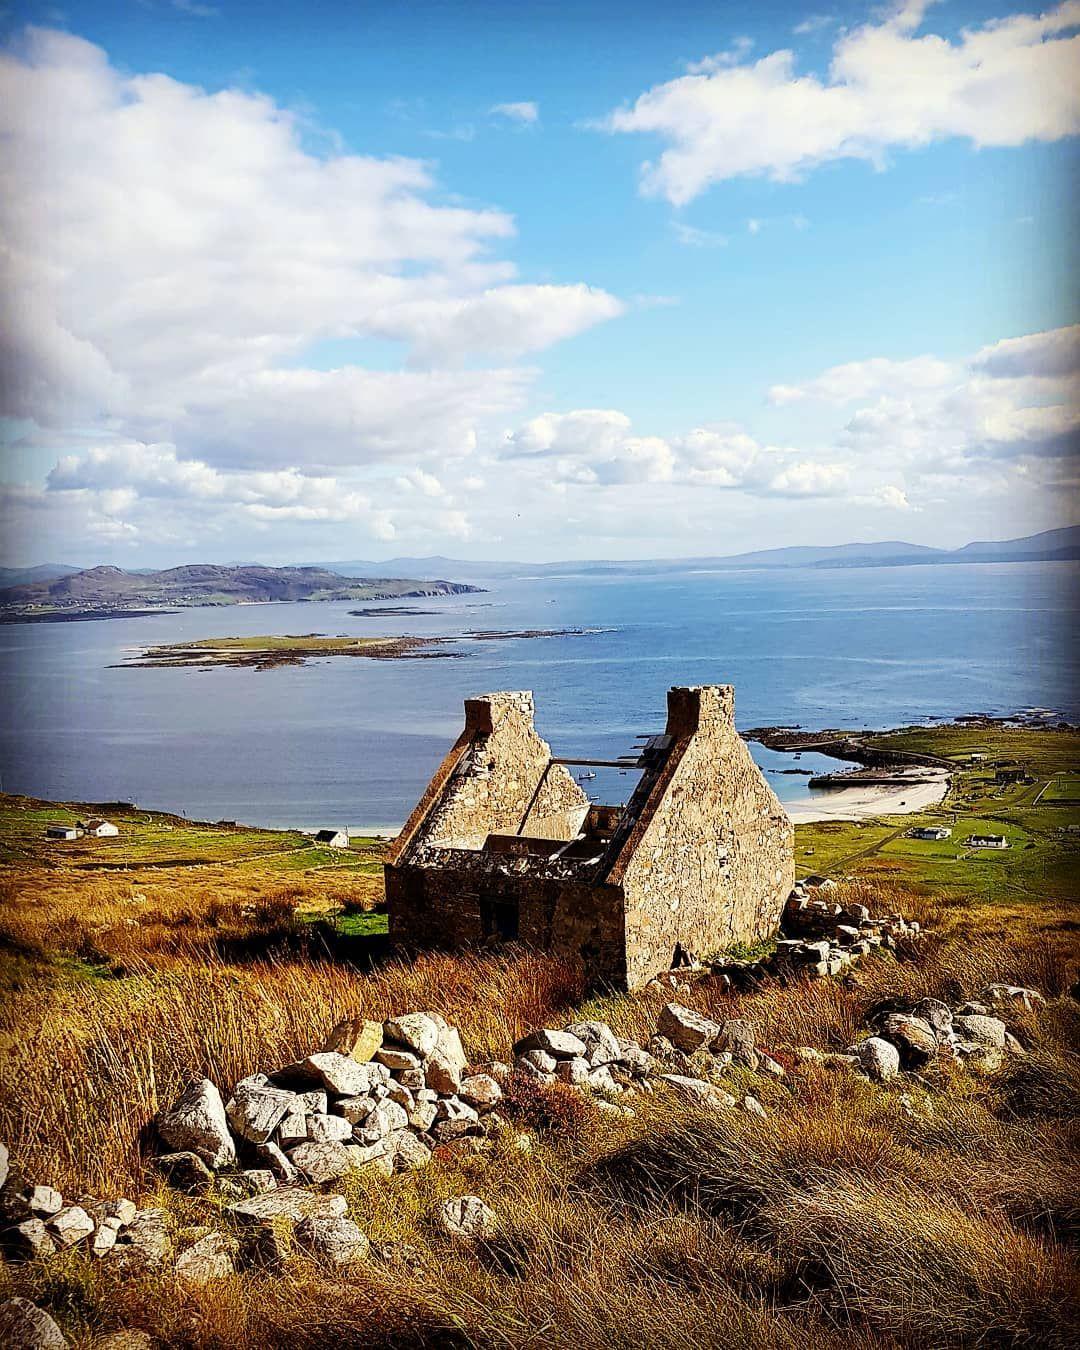 Arranmore Island Co Donegal Arranmorehostel Arranmoreisland Ireland Donegal Wildatlanticway Beautifuldestina Beautiful Destinations Solo Travel Island